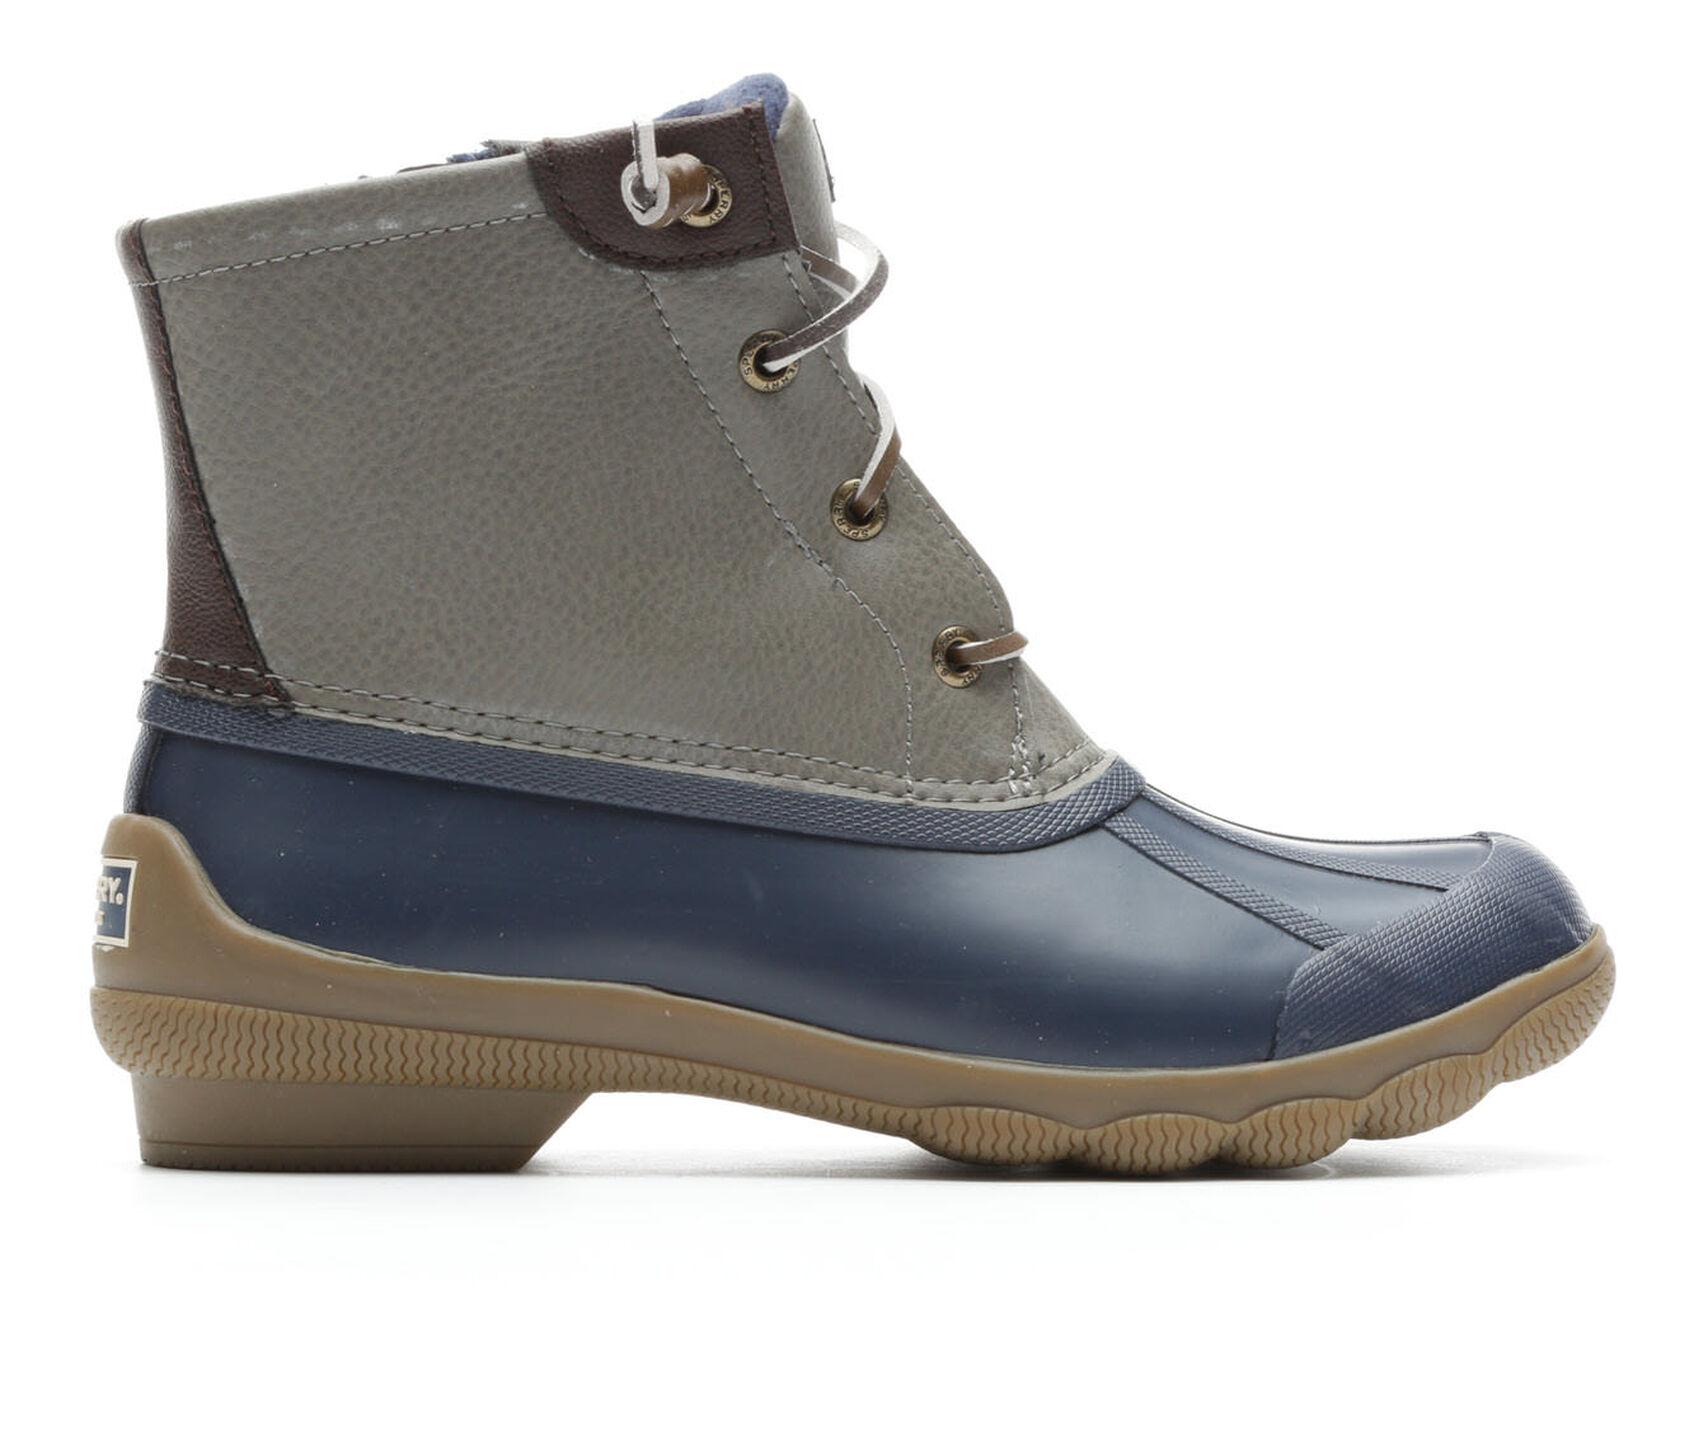 999a8c8b5 Women's Sperry Syren Gulf Duck Boots | Shoe Carnival